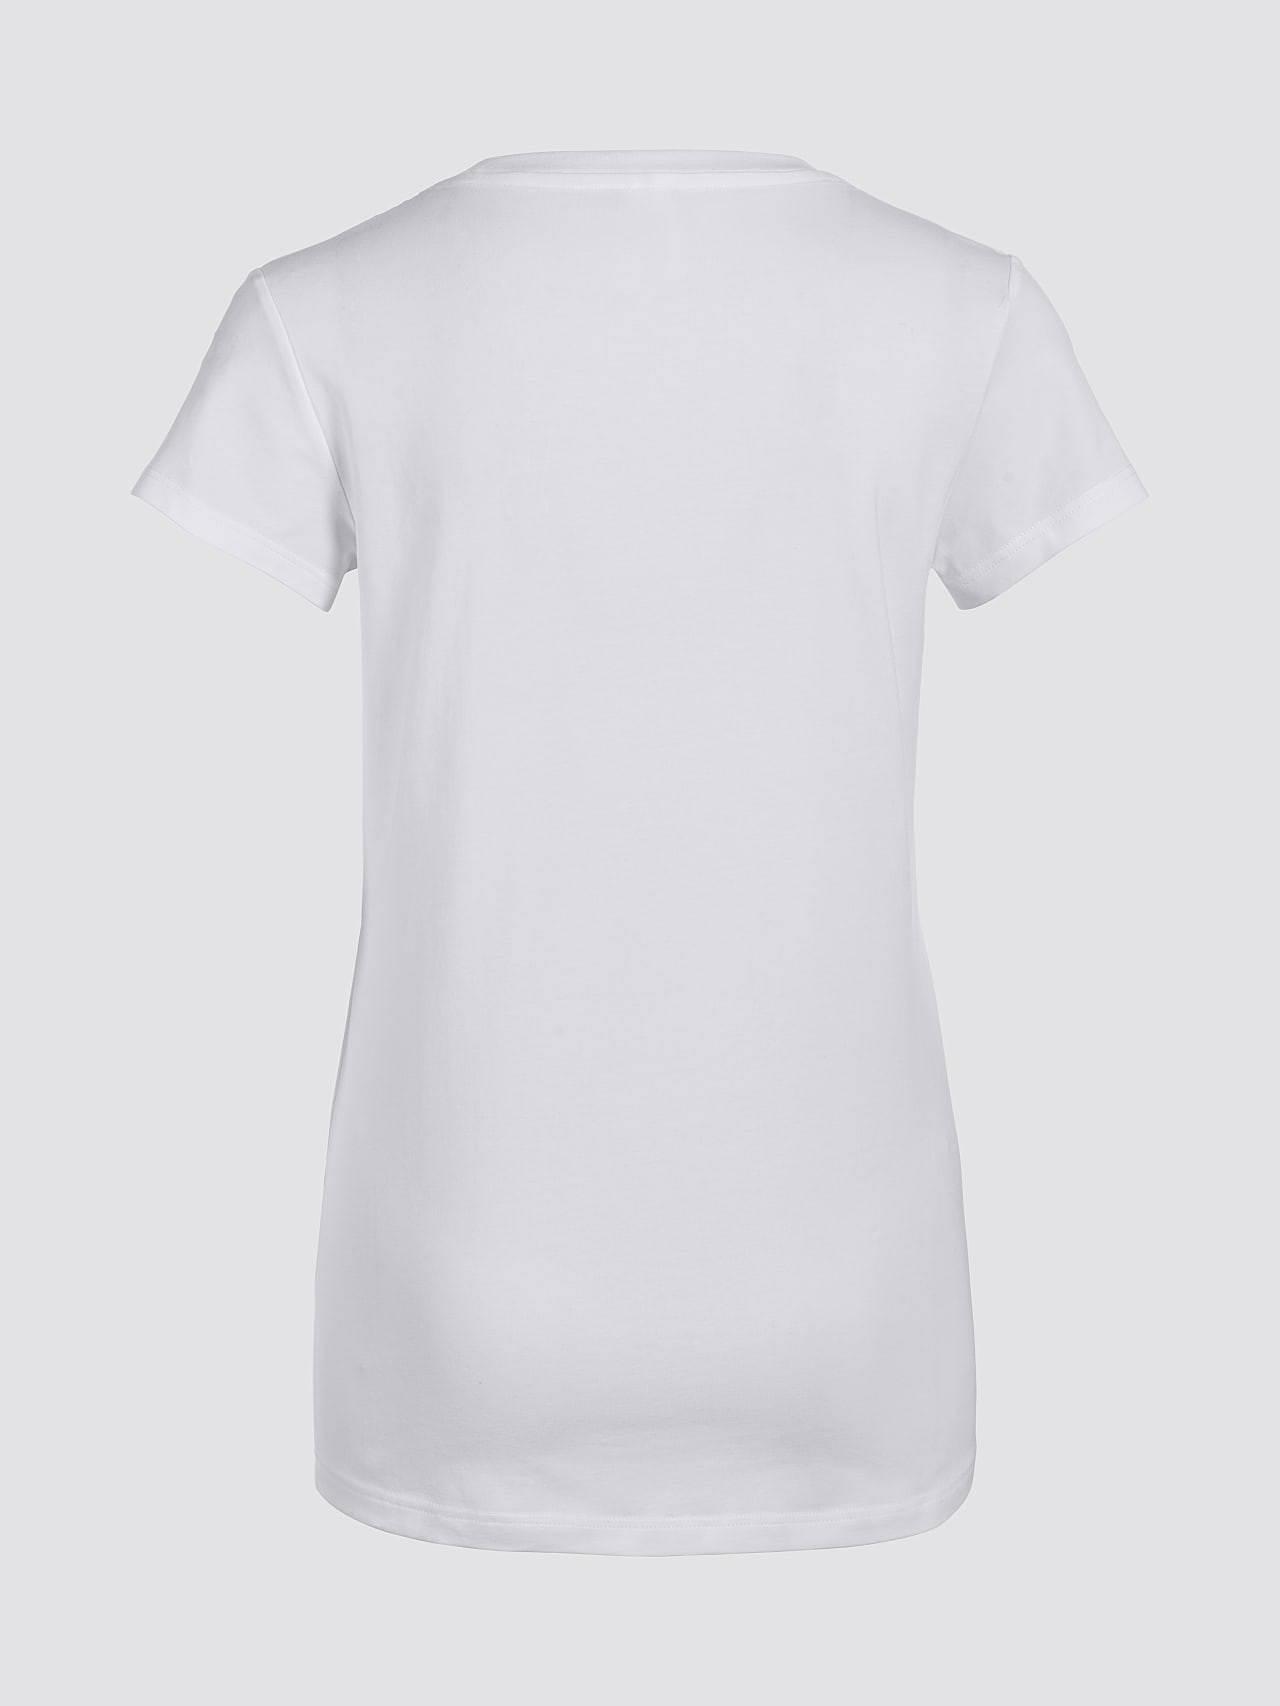 JERU V2.Y4.02 Signature Logo T-Shirt white Left Alpha Tauri